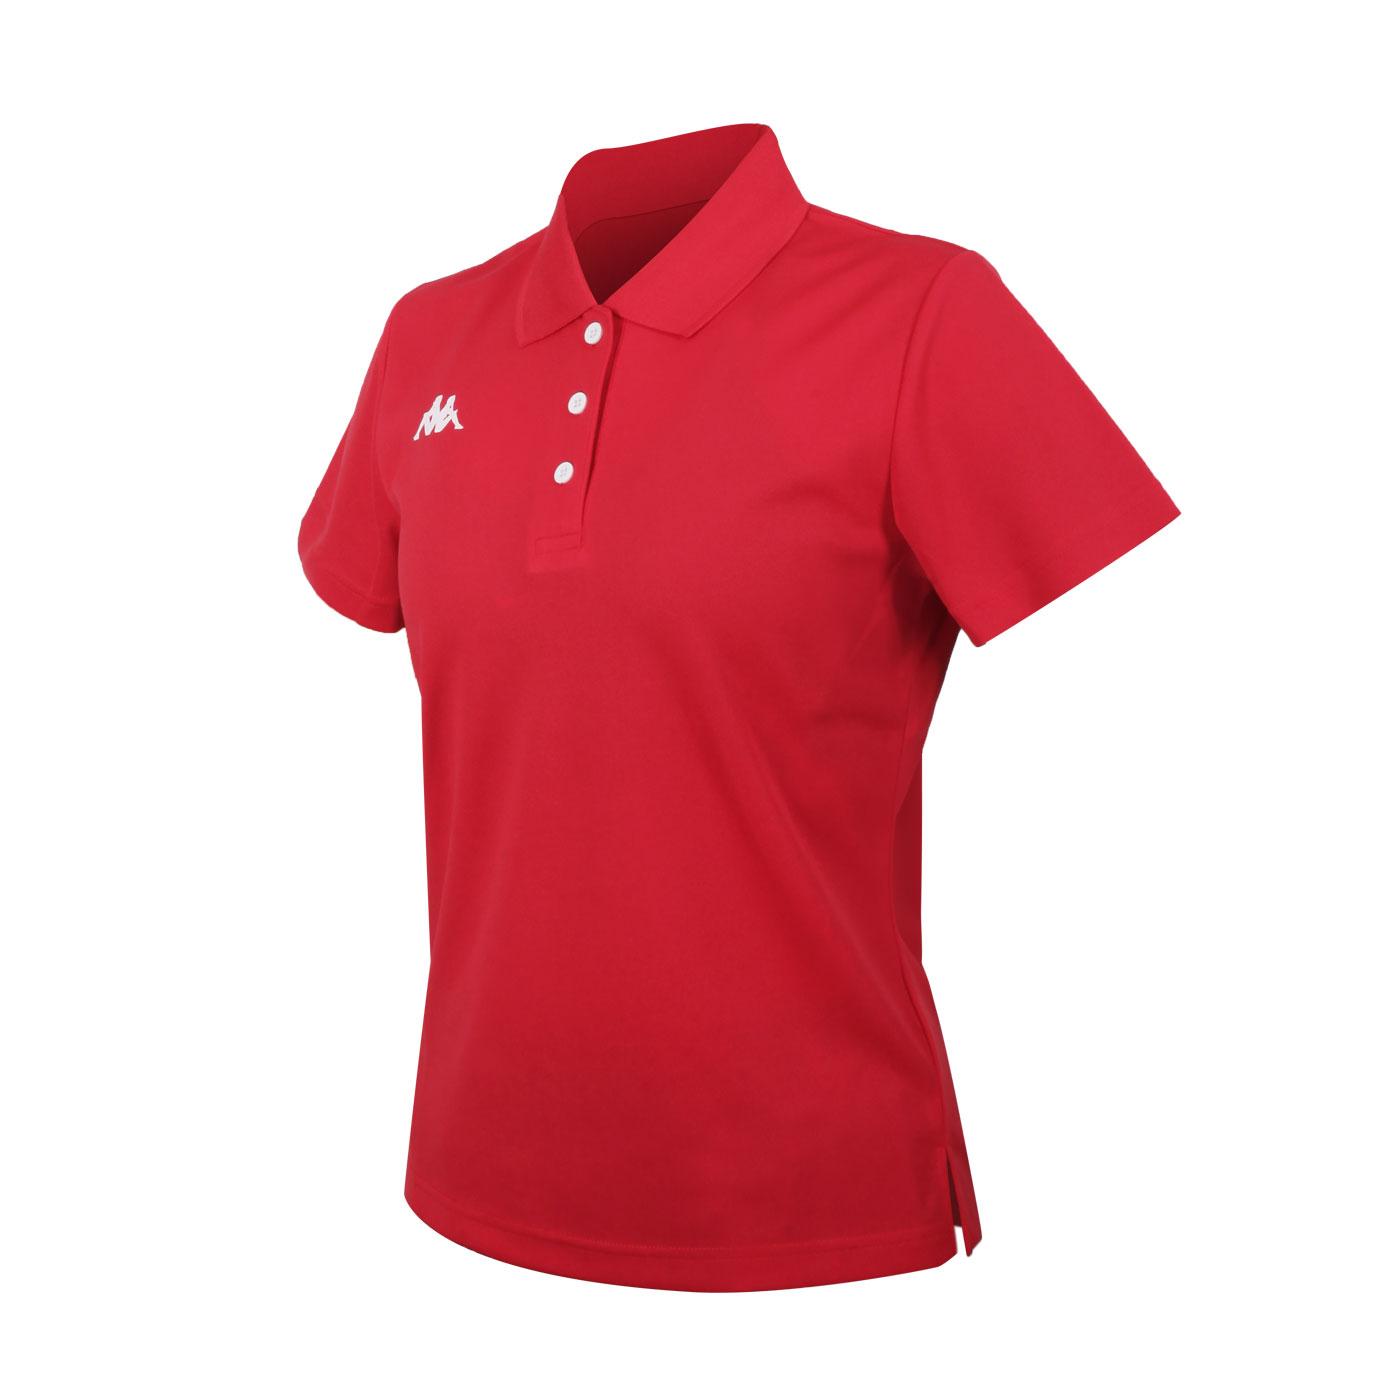 KAPPA 女款K4T短袖POLO衫 321763W-D18 - 紅白